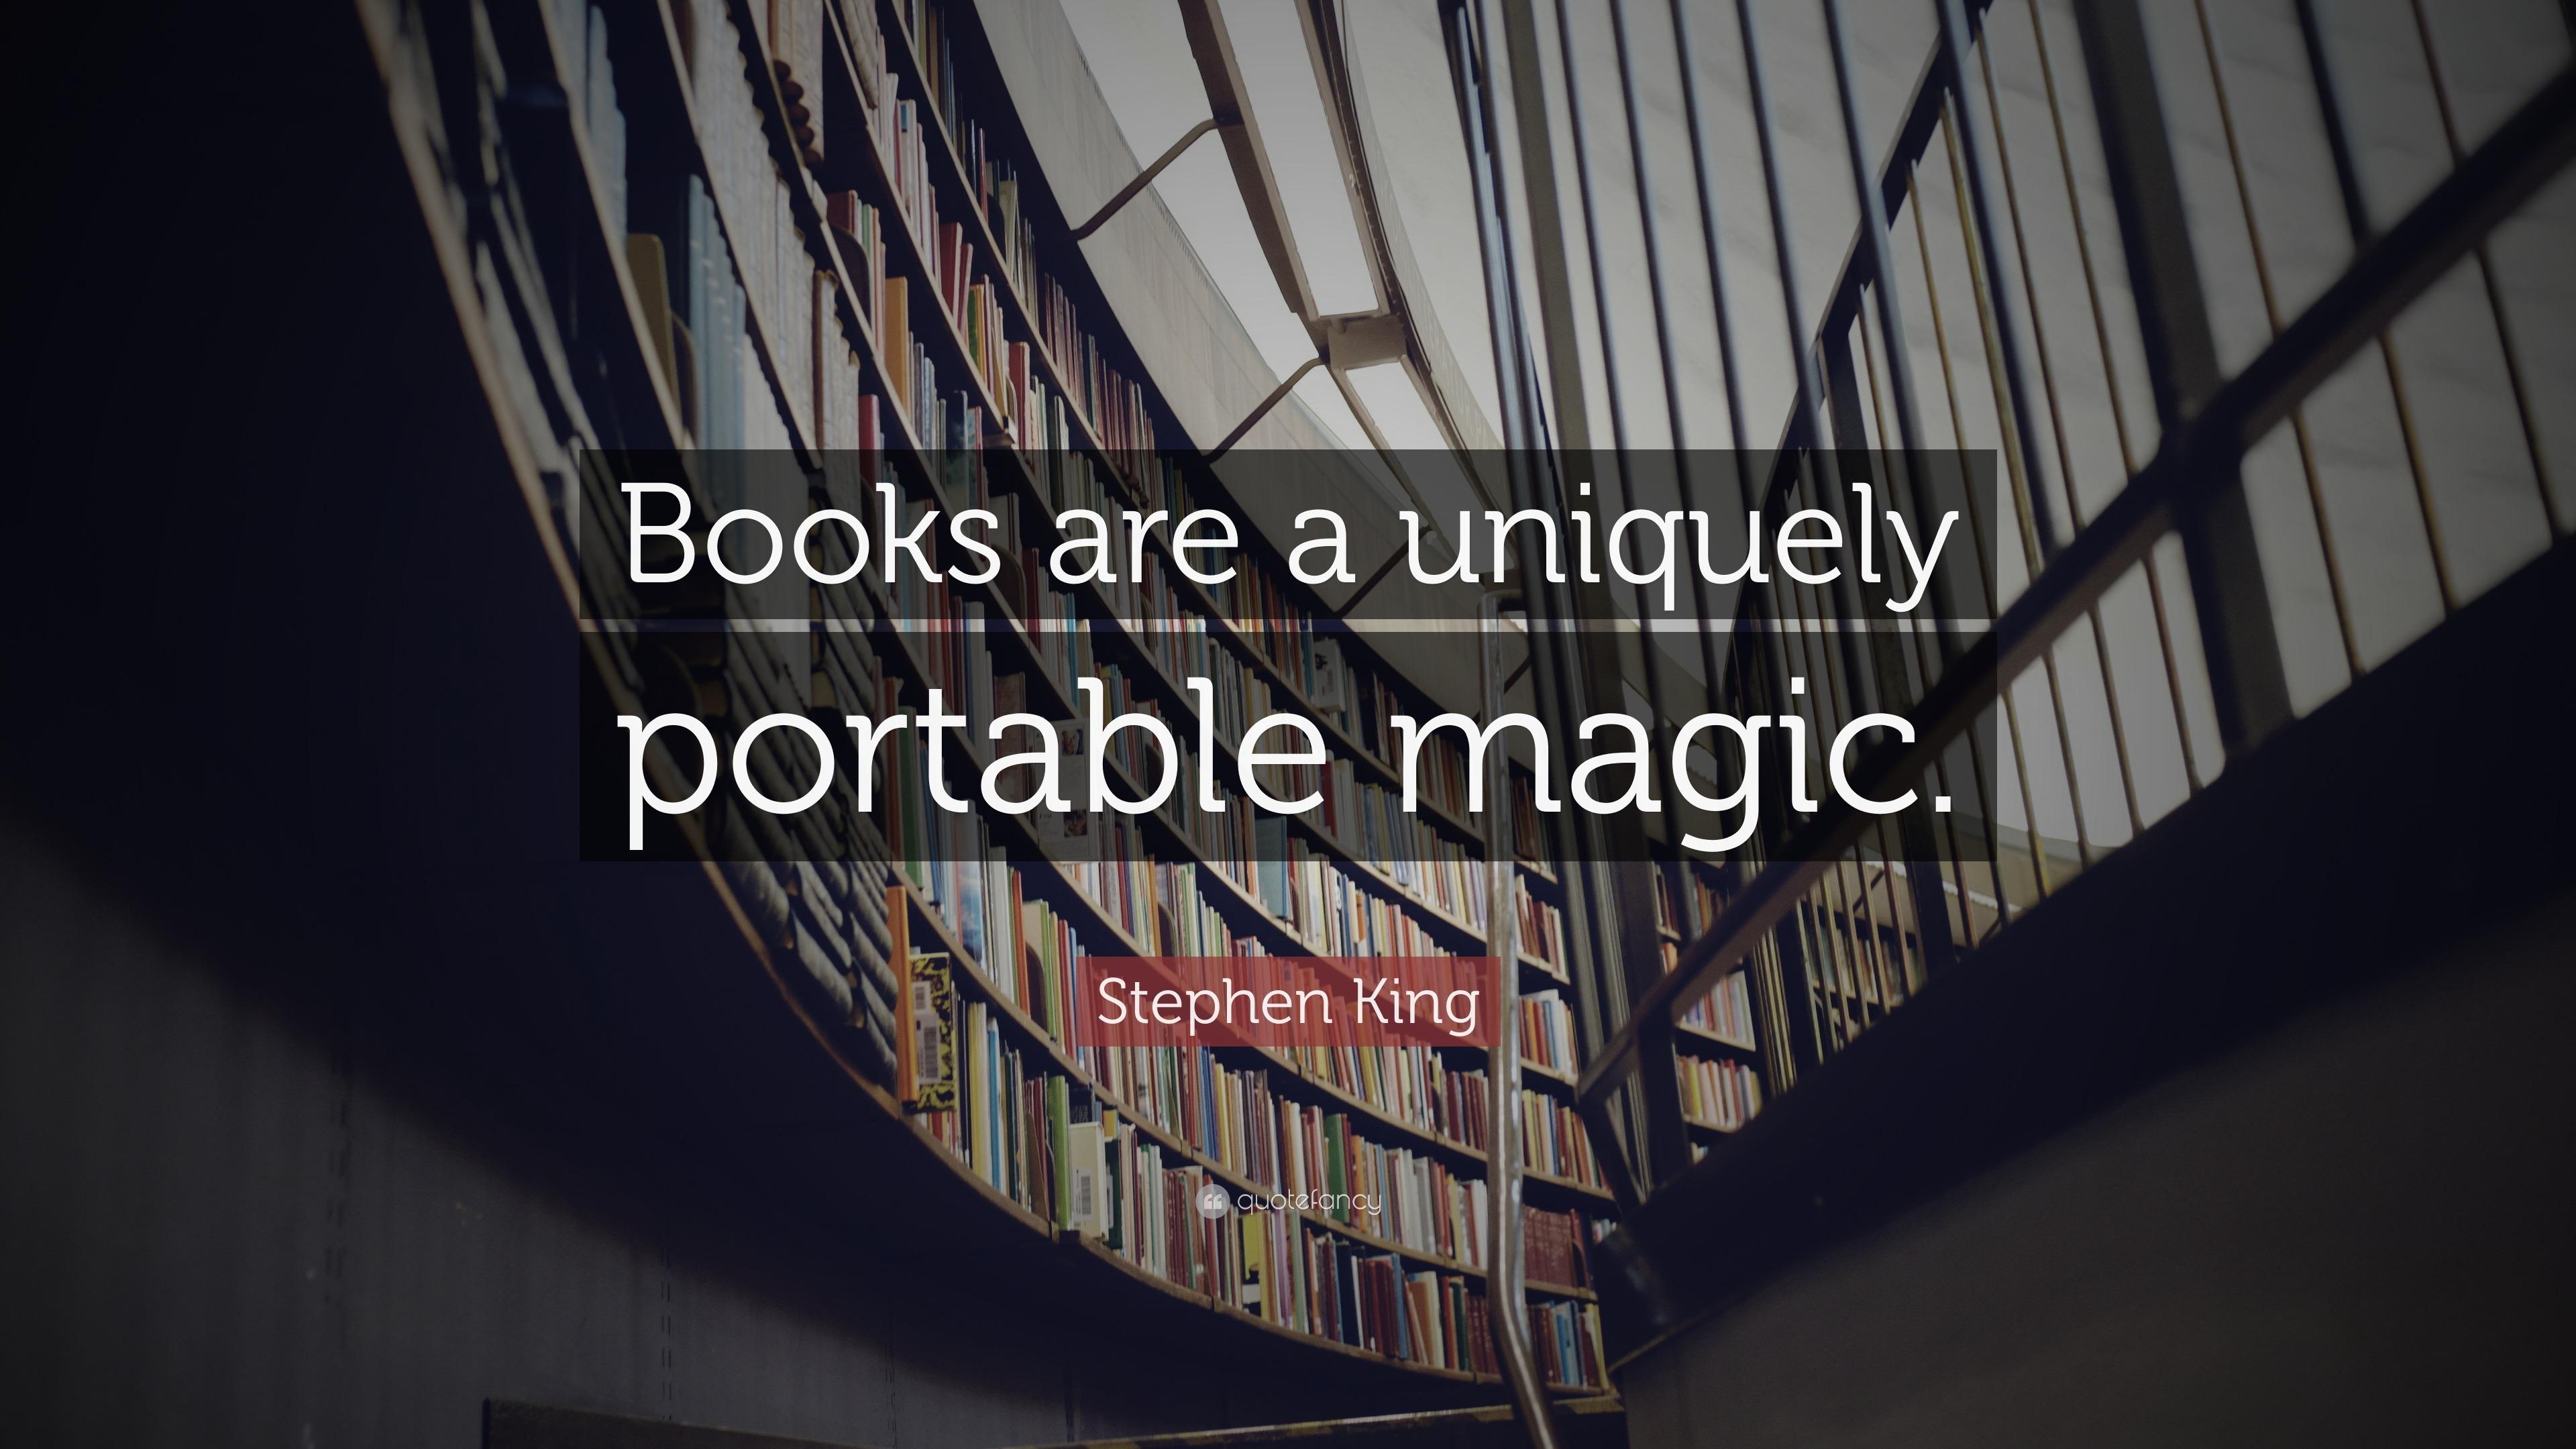 John Lennon Quotes Wallpaper Stephen King Quote Books Are A Uniquely Portable Magic